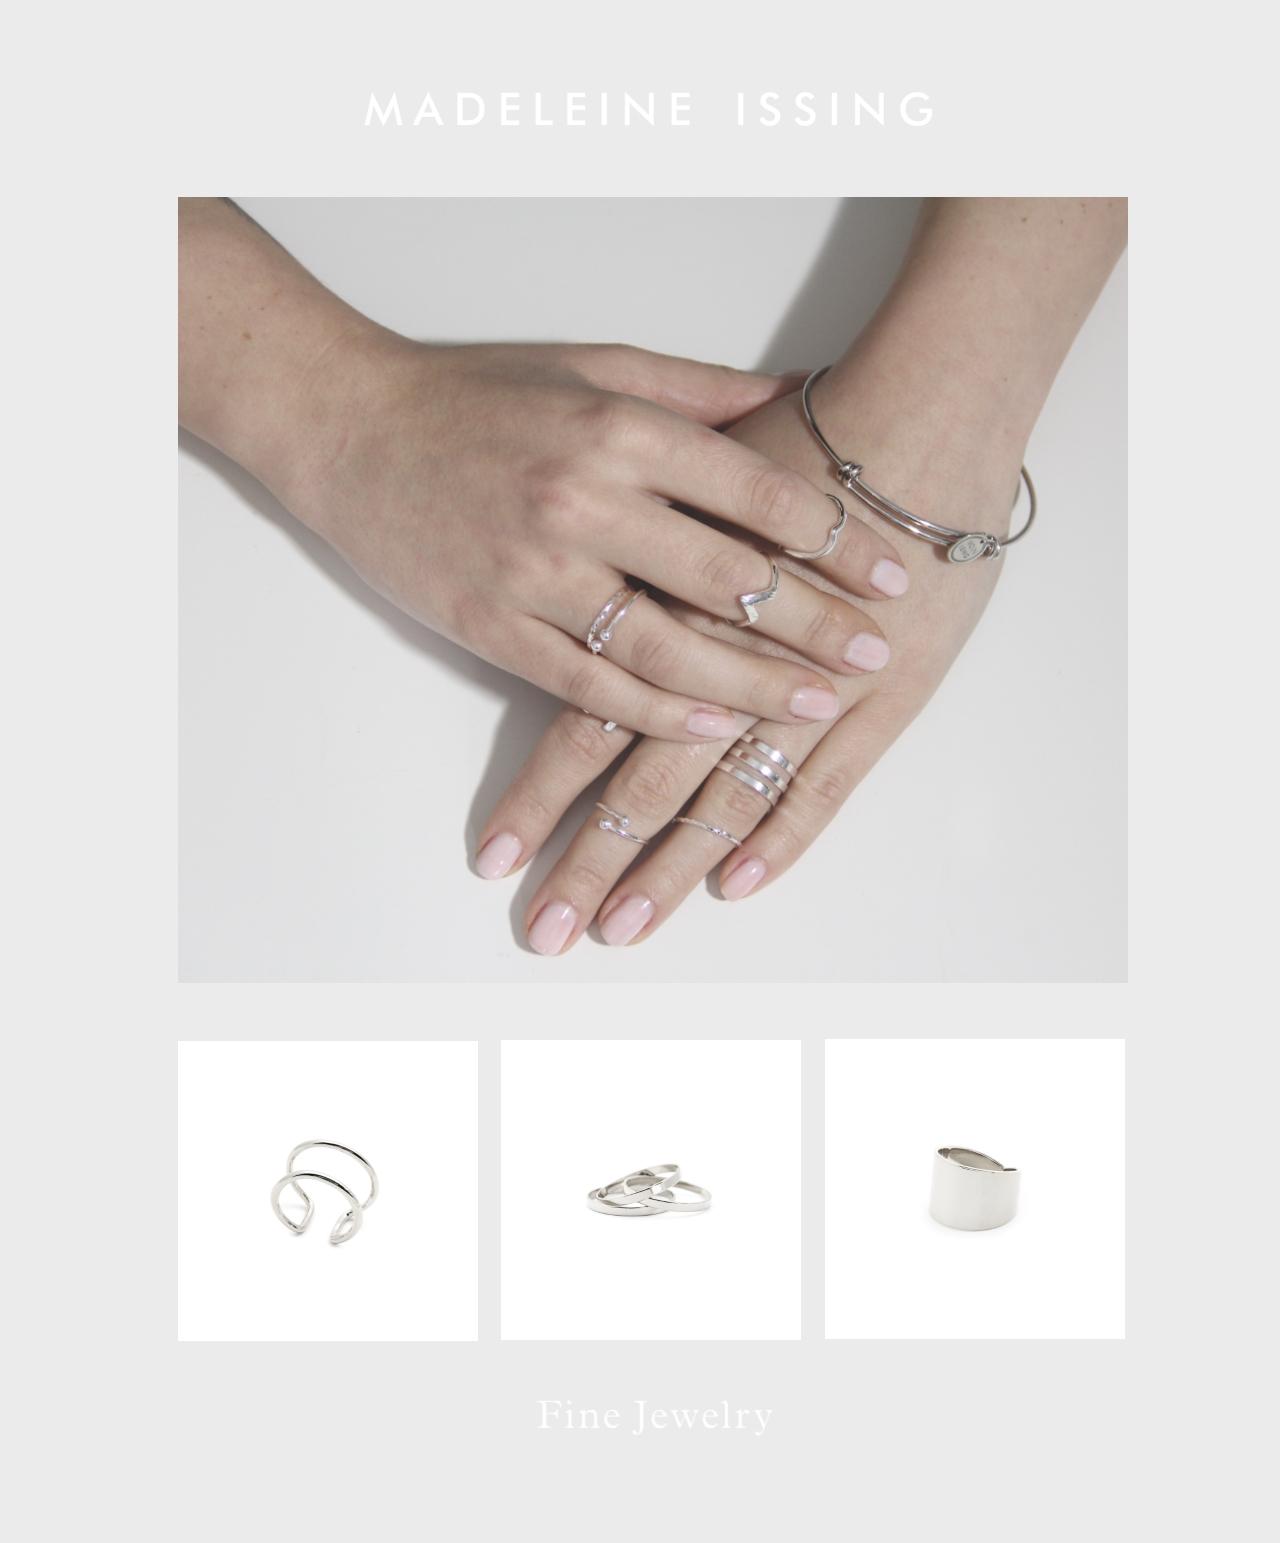 fingerkuppenringe und knuckle ringe silber madeleine issing